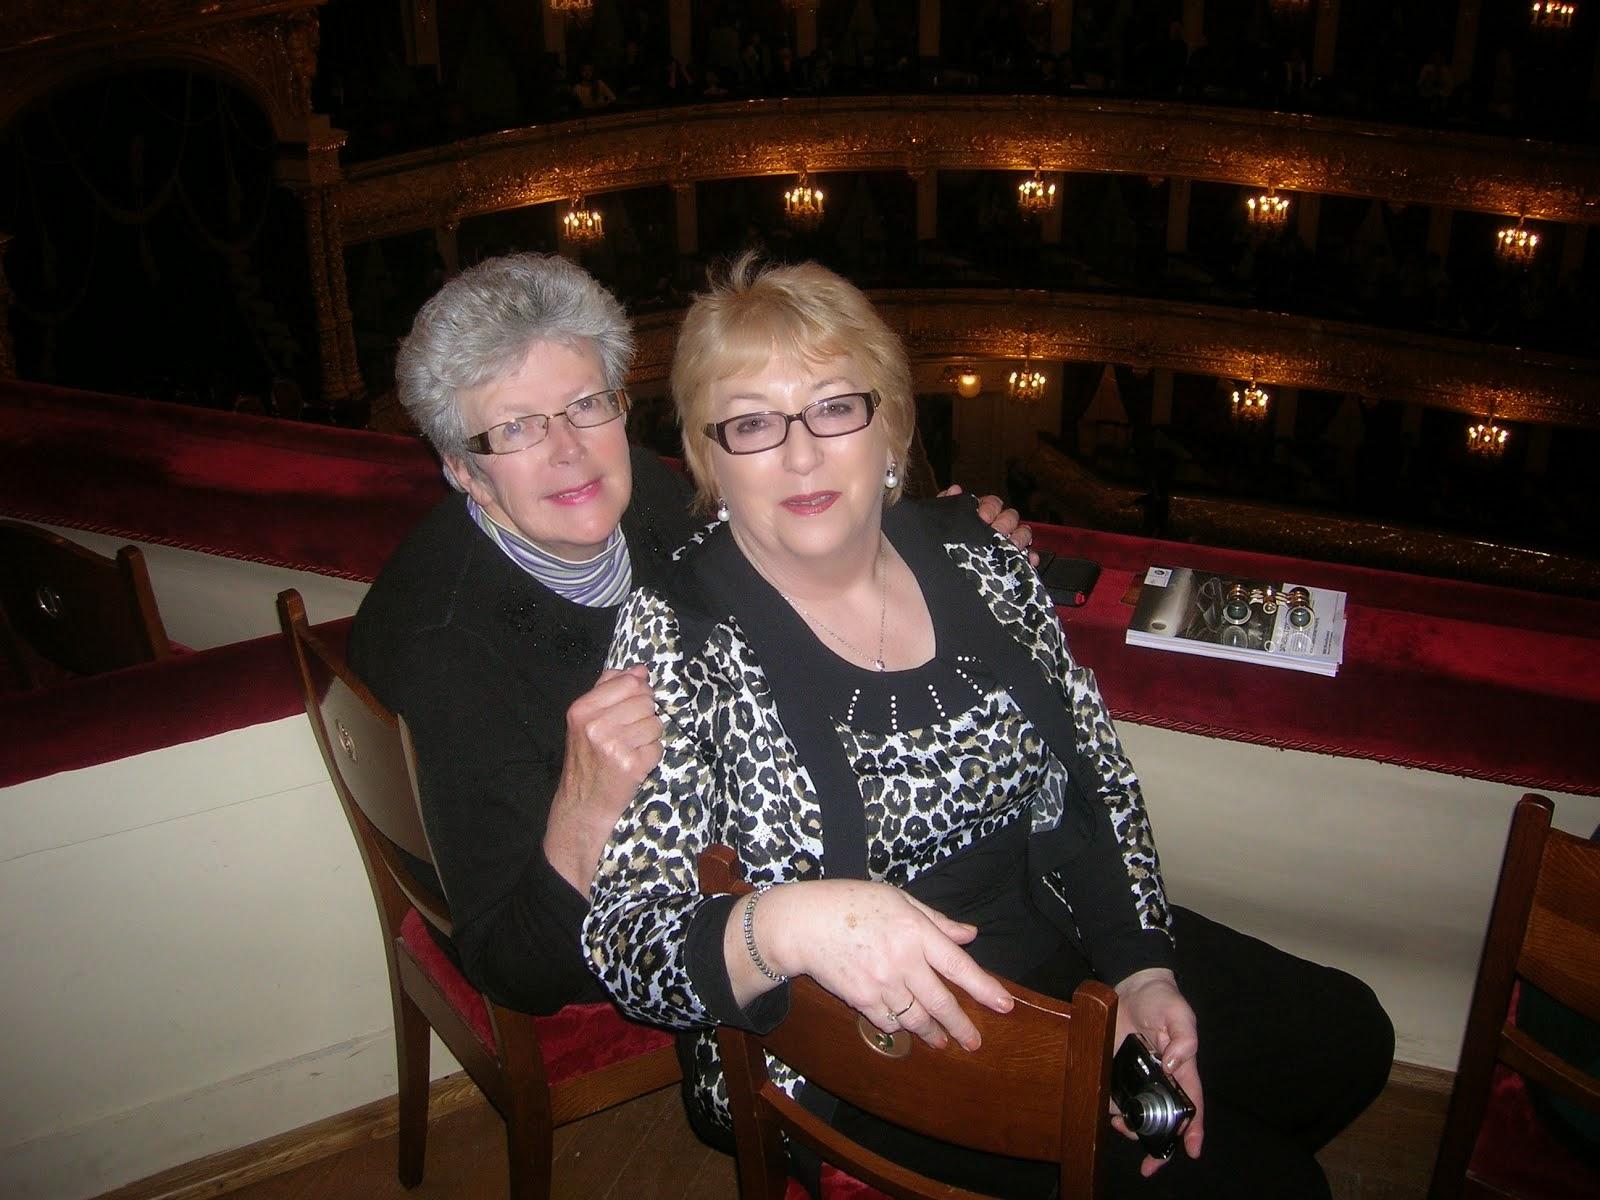 Ann Mc Loughlin and I at the Theatre.